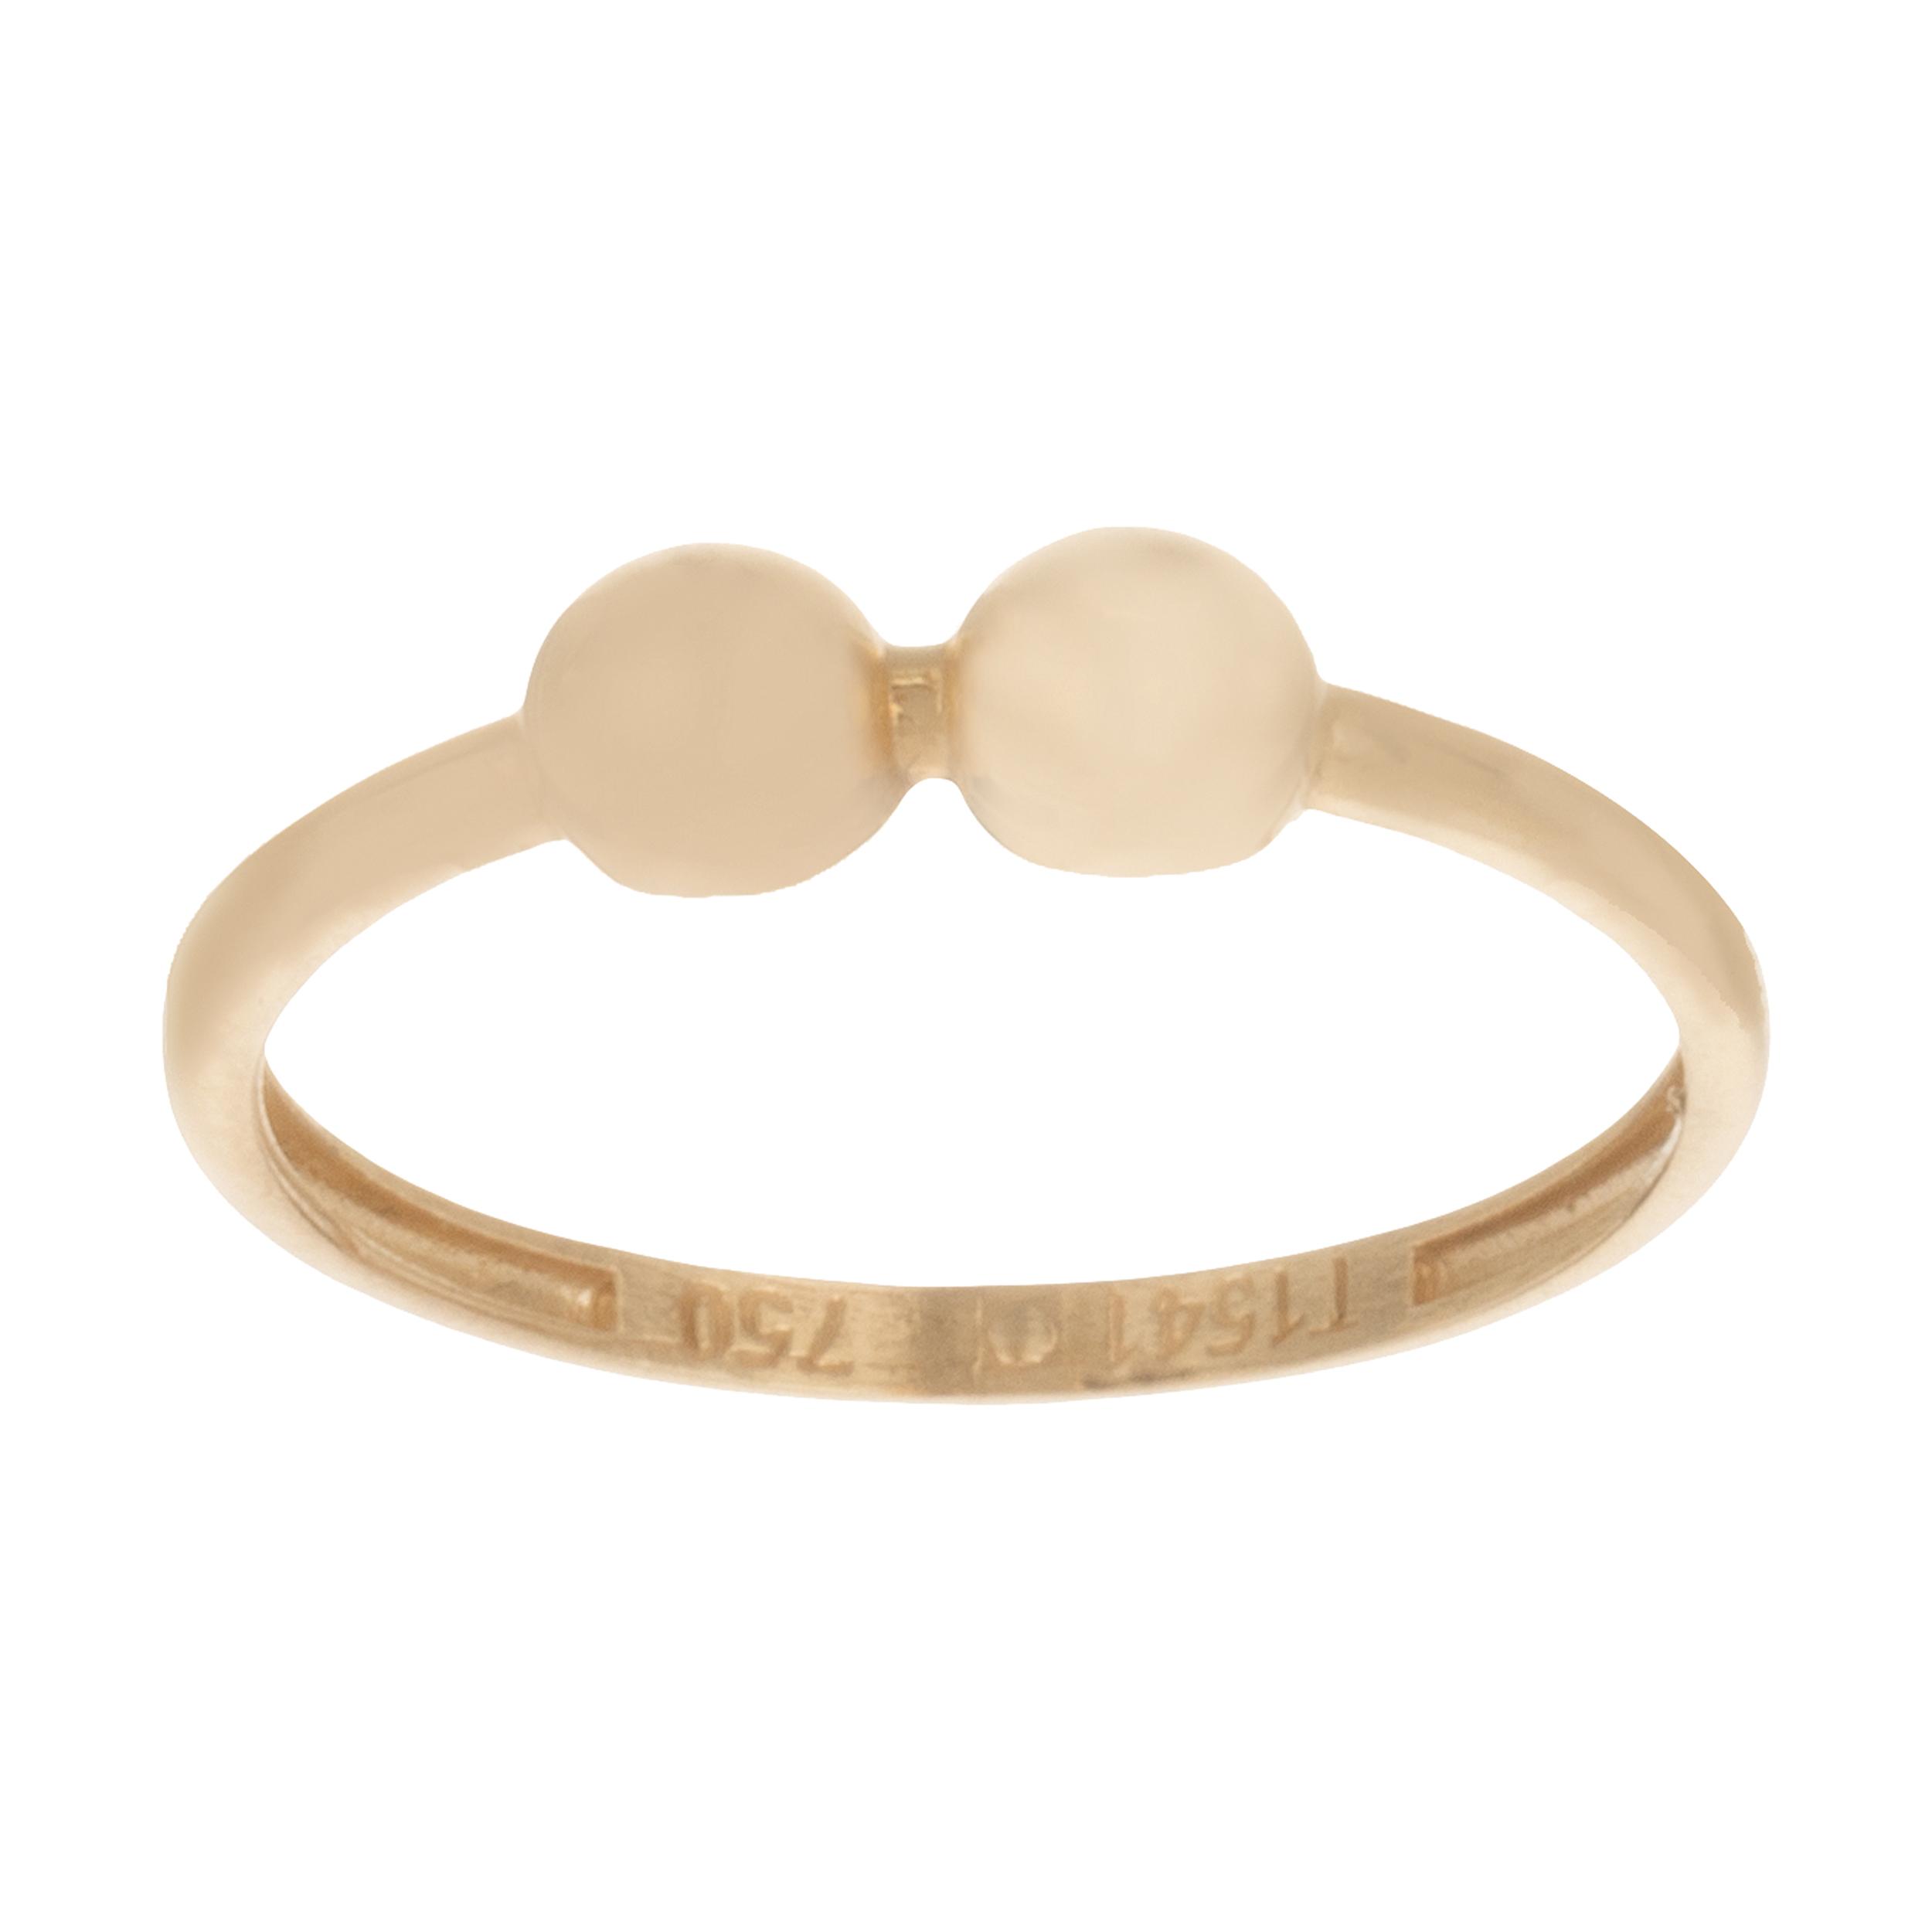 انگشتر طلا 18 عیار زنانه الماسین آذر طرح پاپیون کد P01